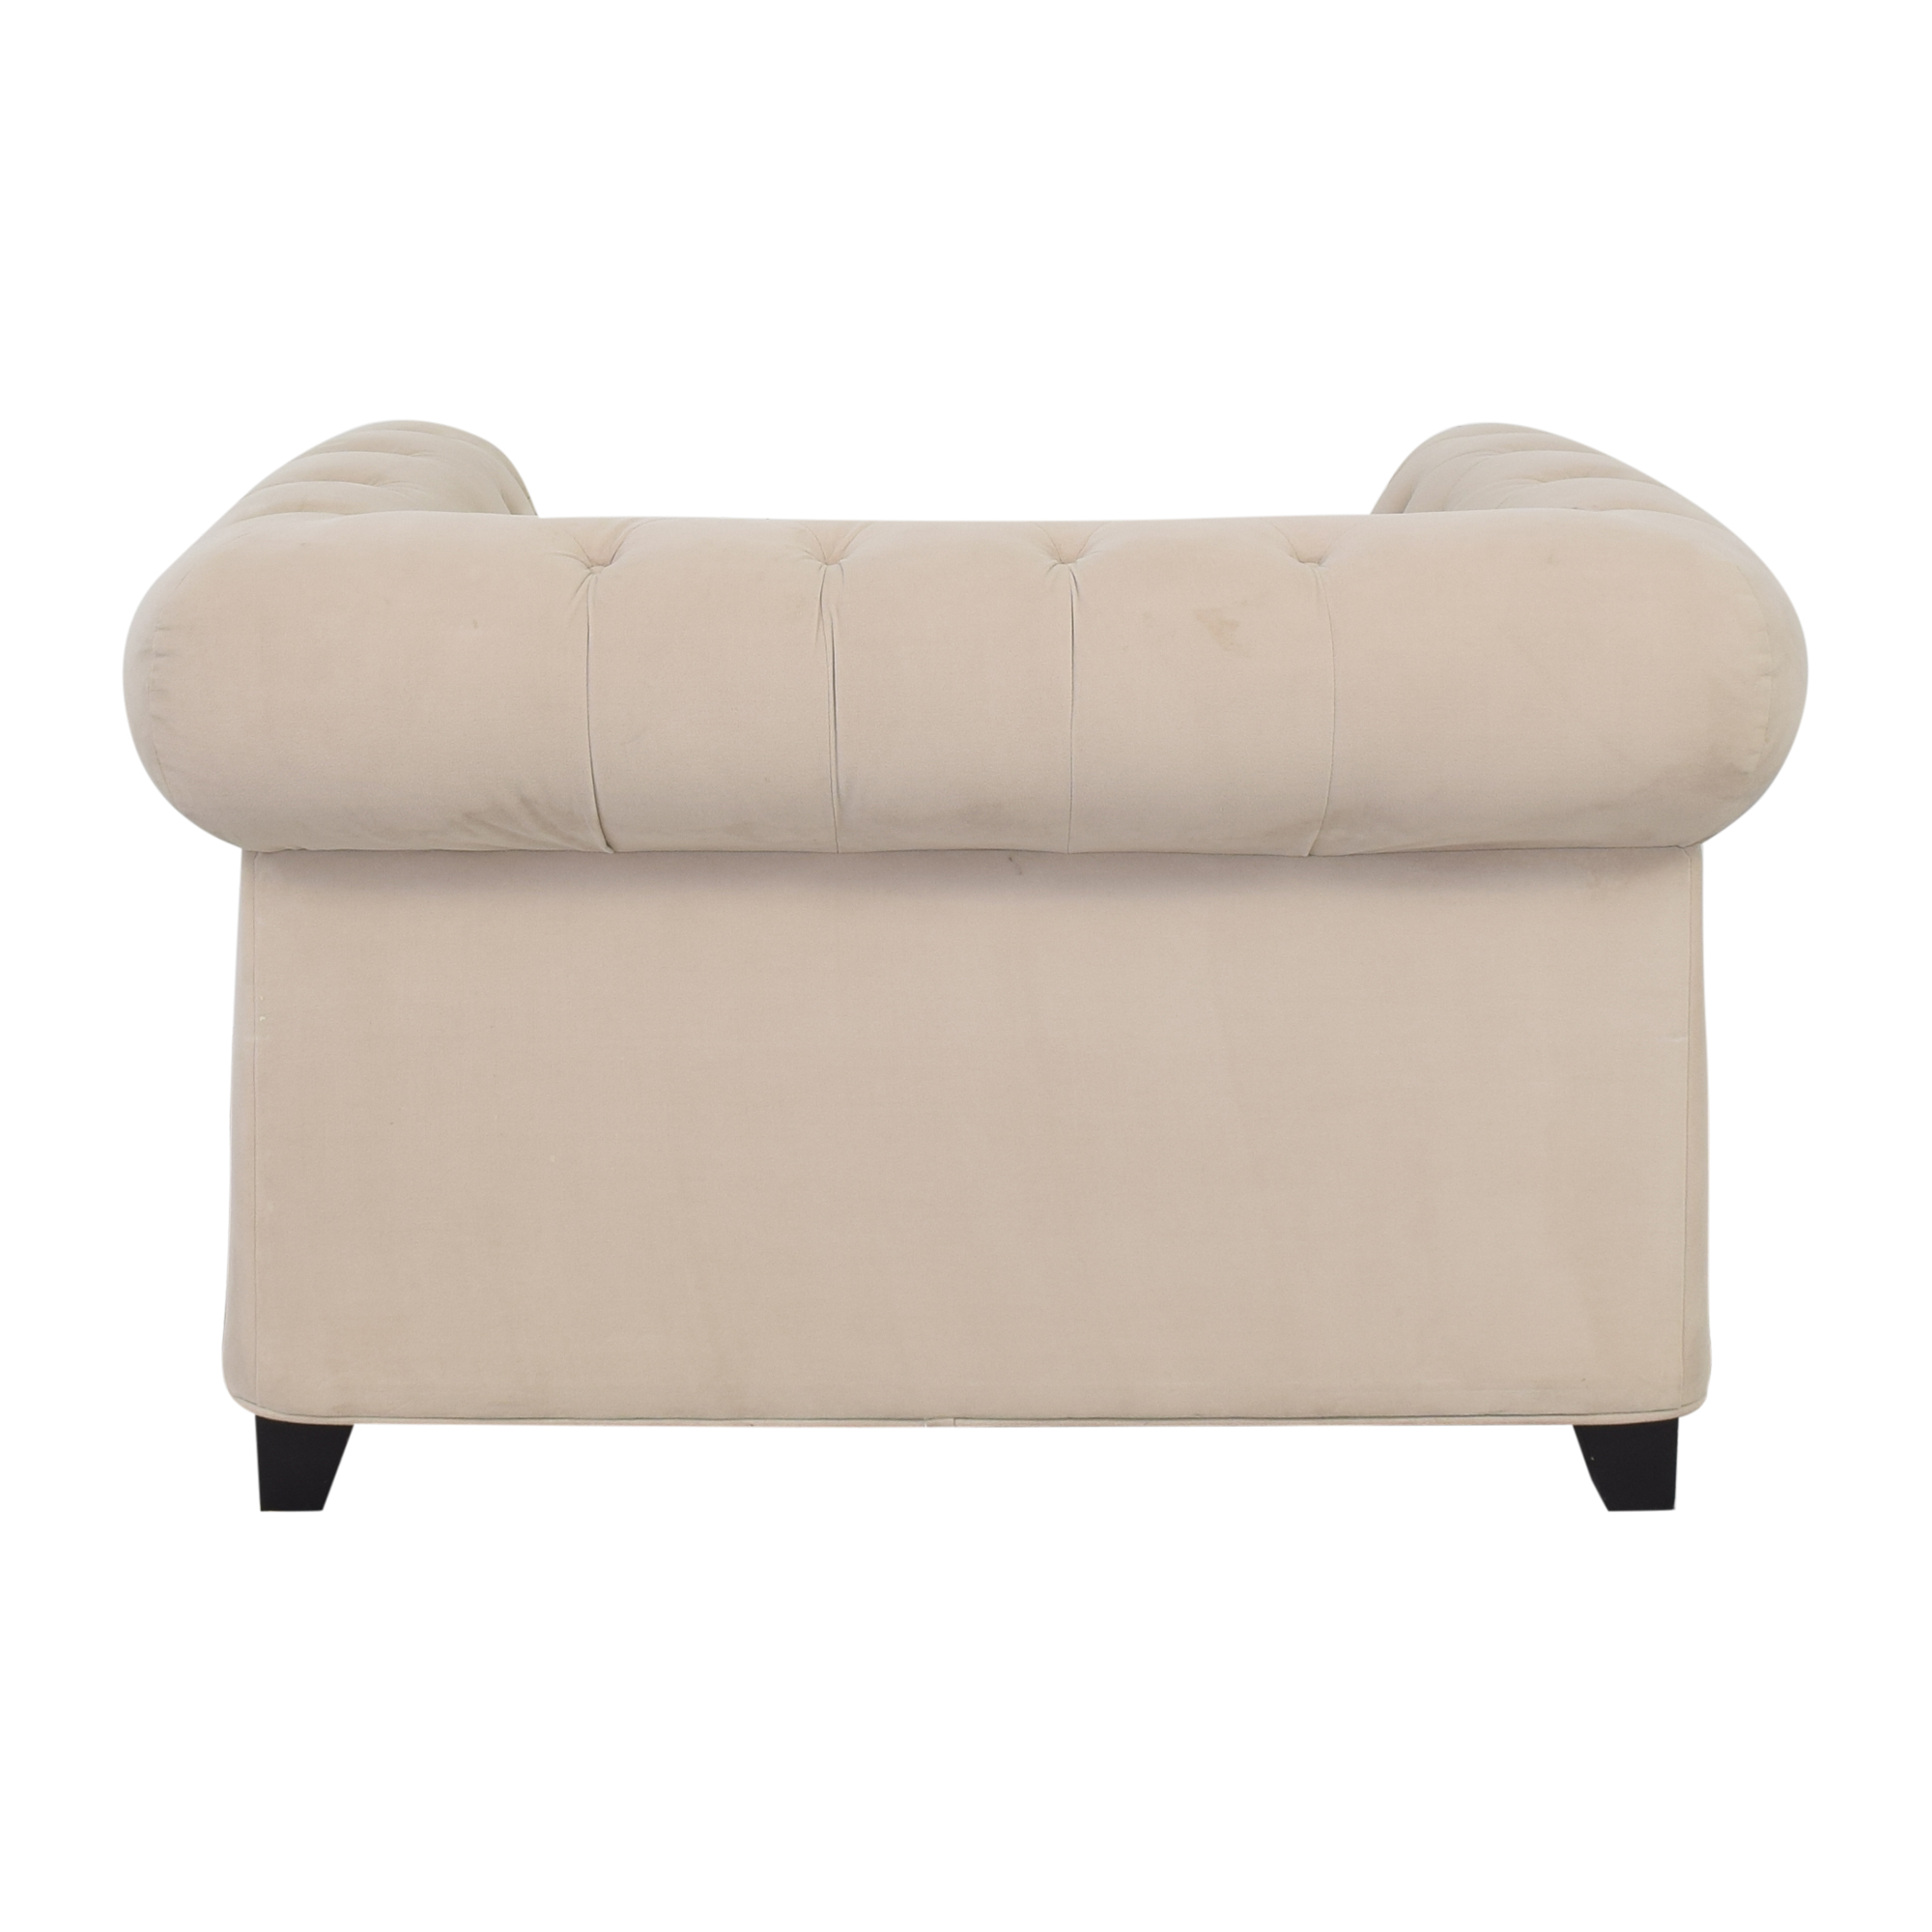 buy Macy's Macy's Martha Stewart Collection Saybridge Arm Chair online